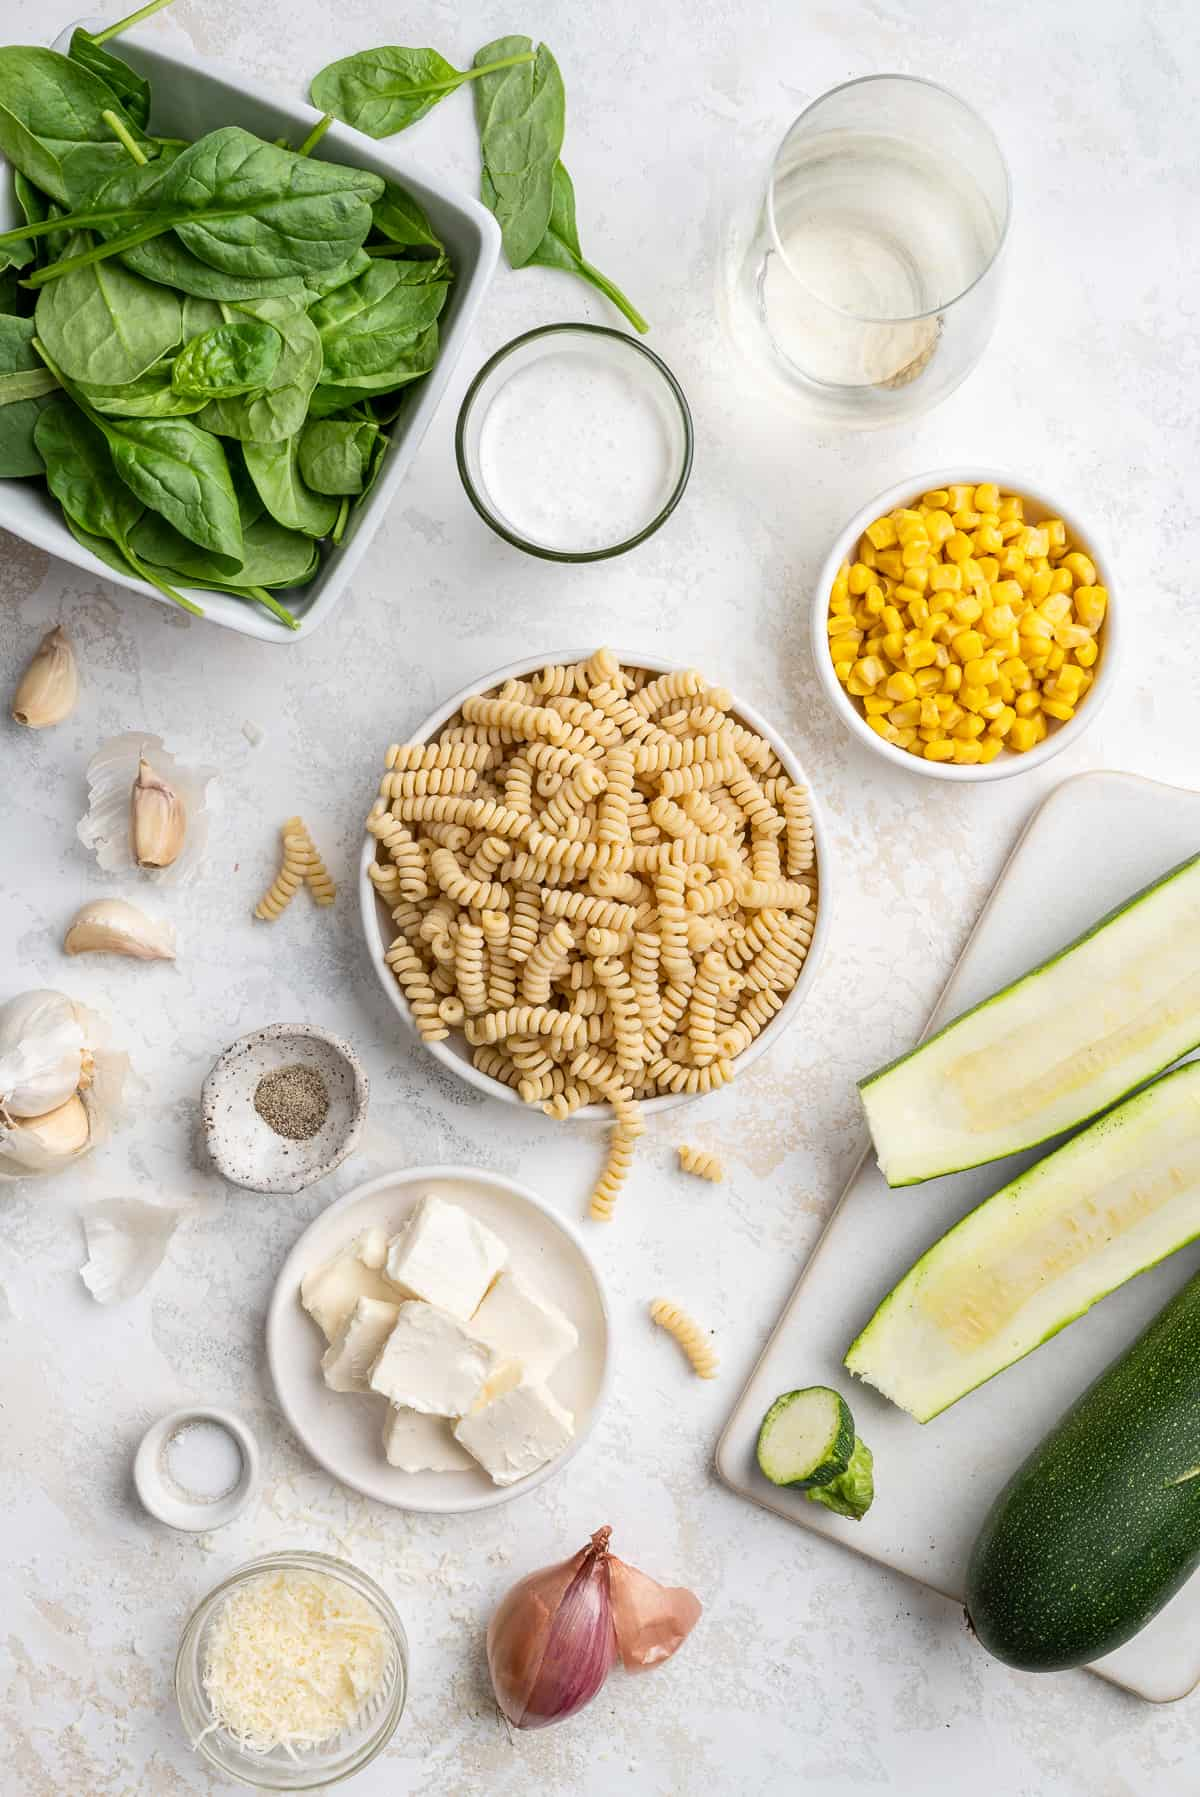 summer pasta ingredients: fusilli, zucchini, corn, spinach, shallot, garlic, salt, pepper, cheese, butter, white wine, heavy cream